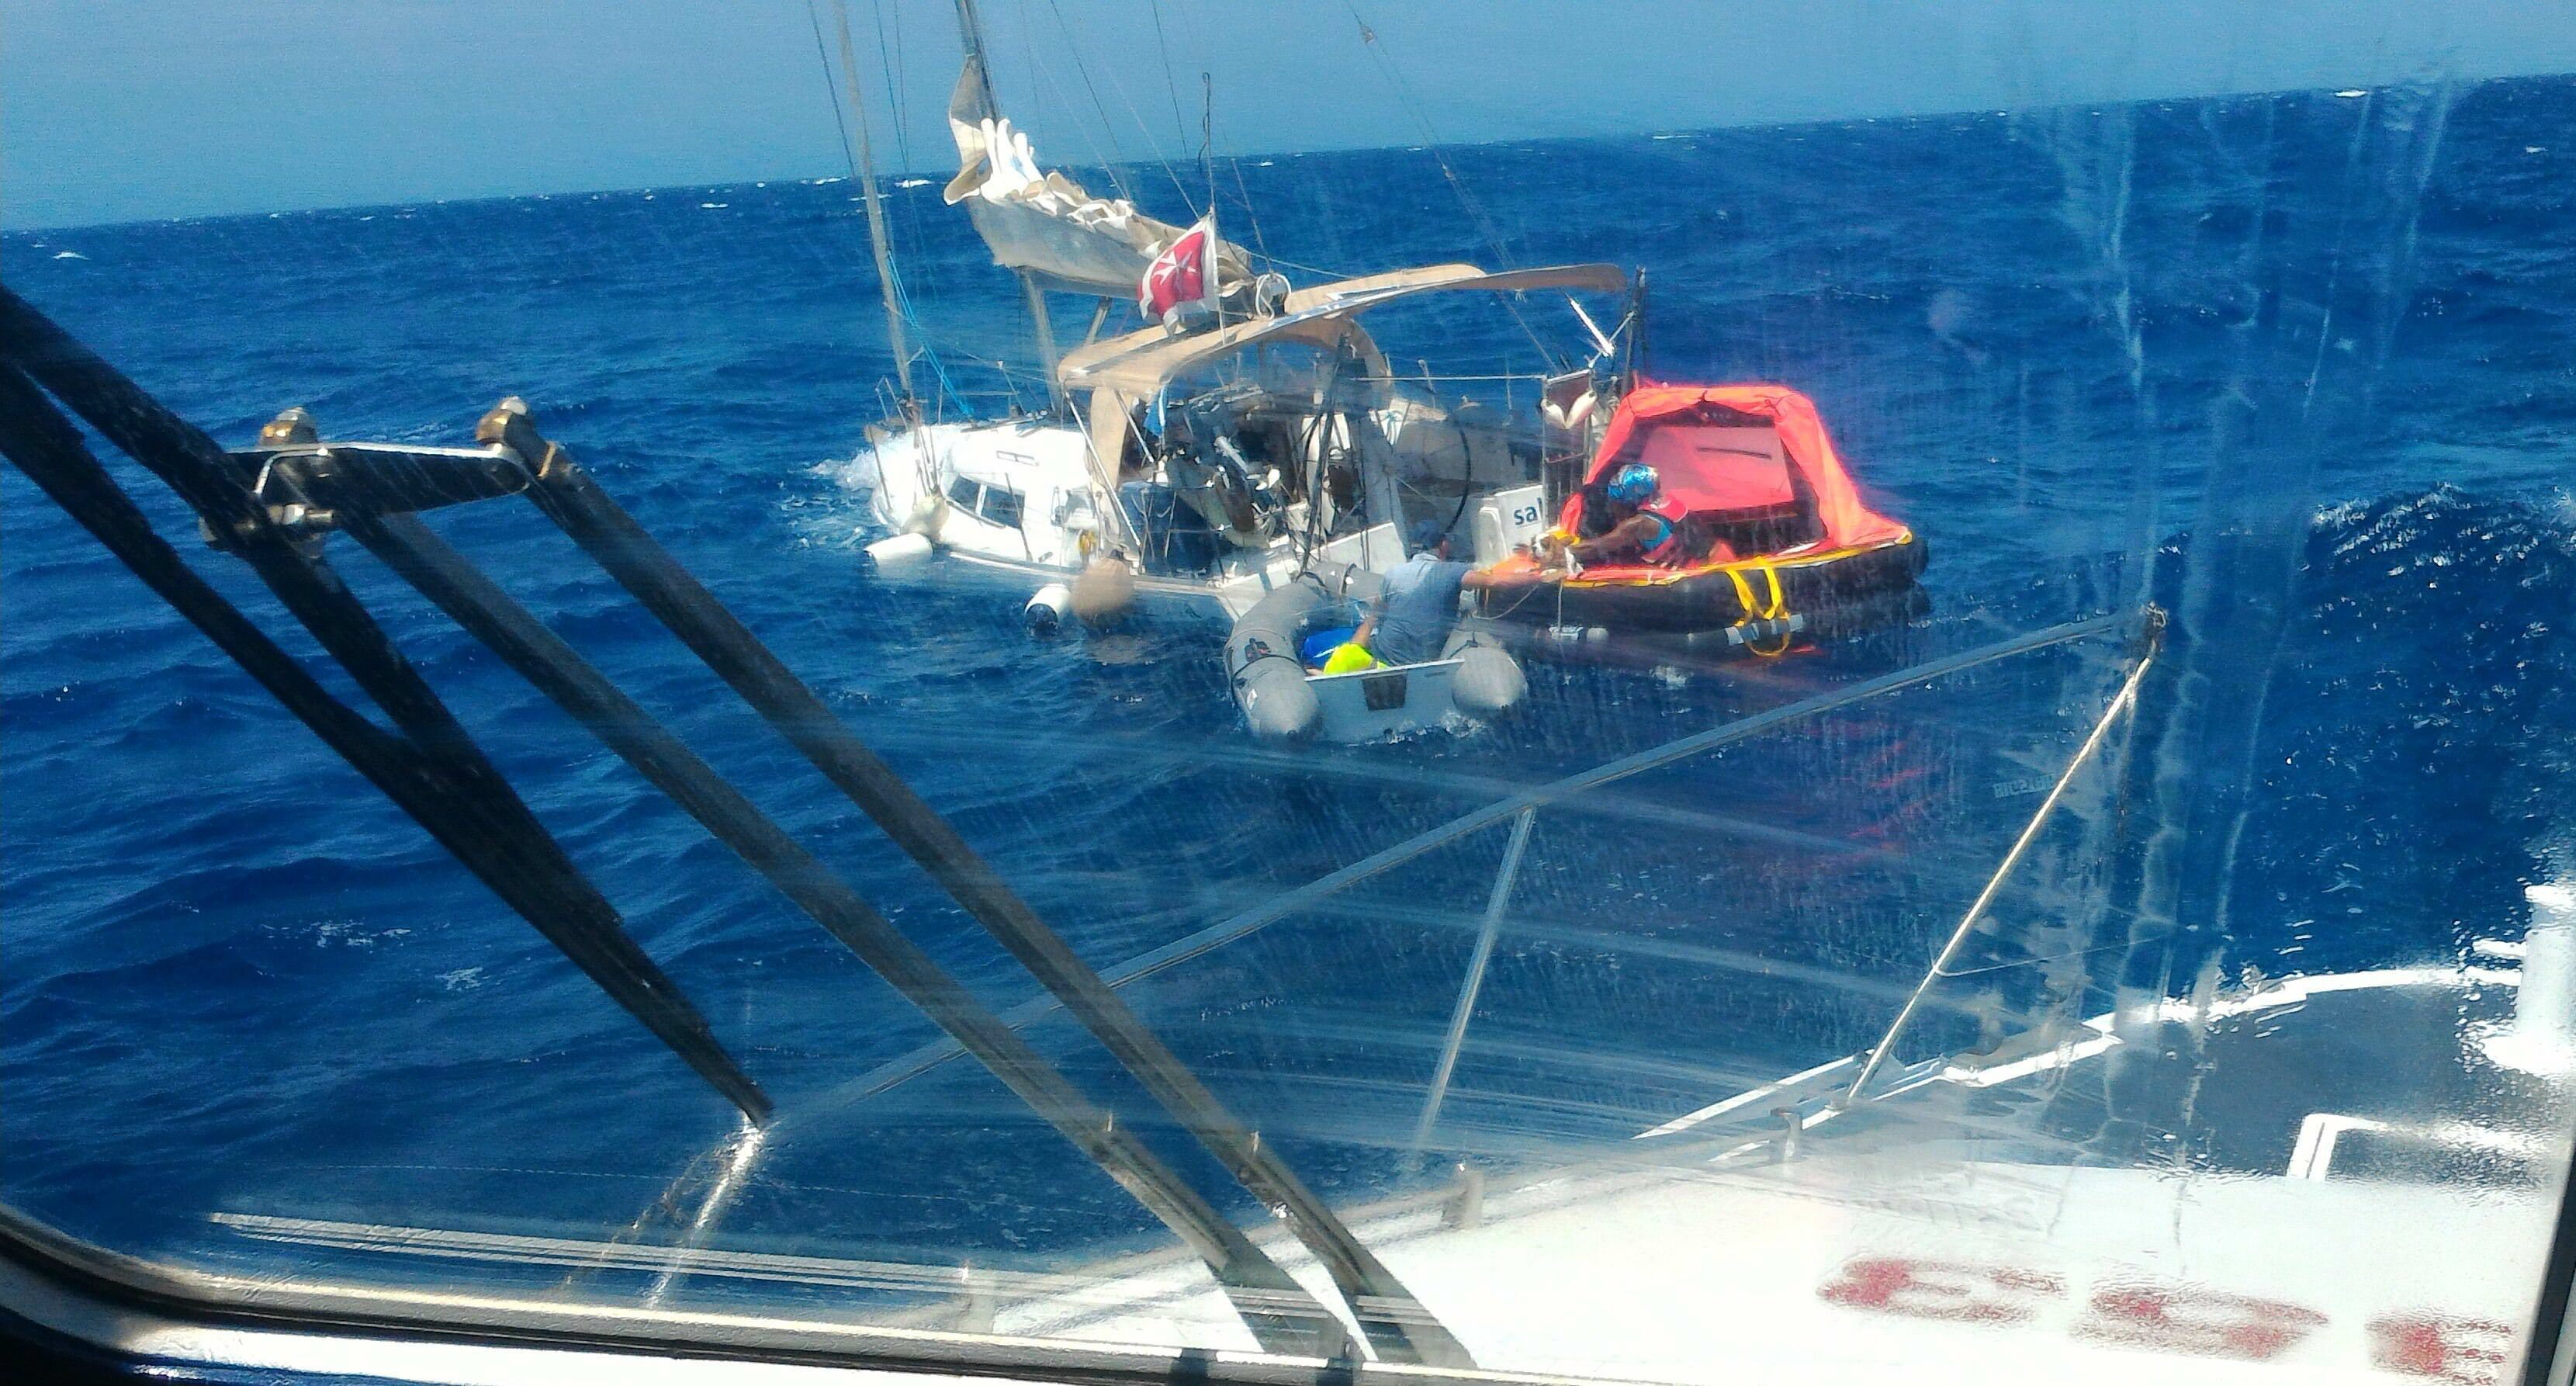 Barca a vela affonda, salvati due diportisti stranieri